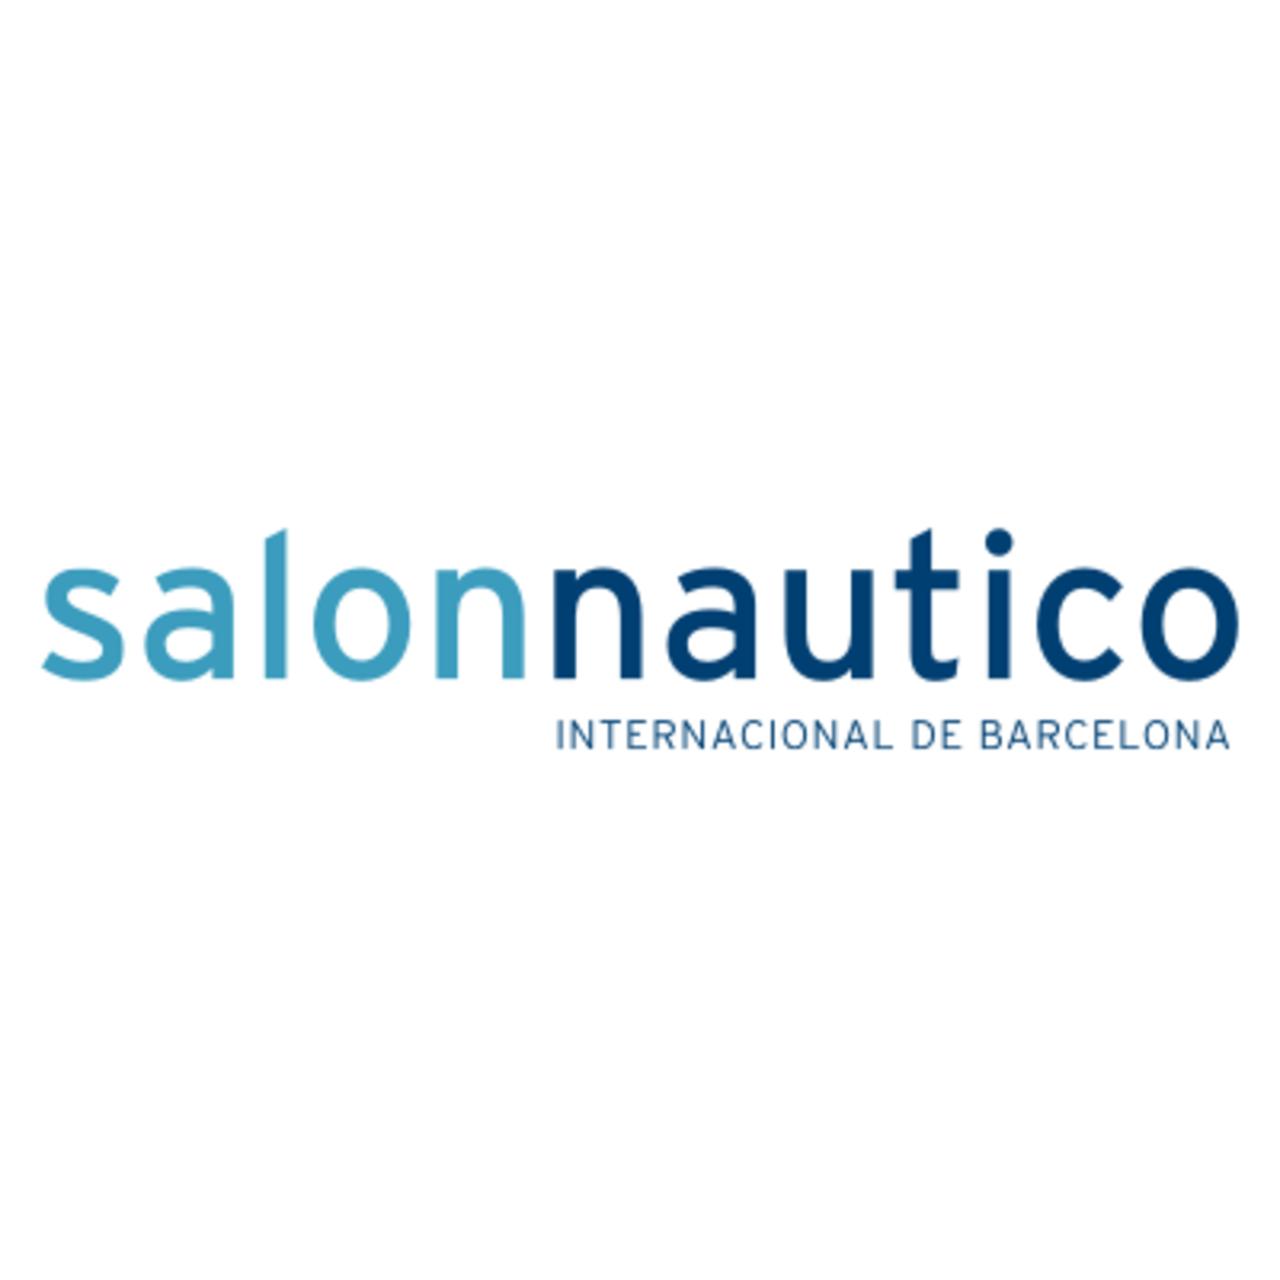 Barcelona Boat Show - Spain